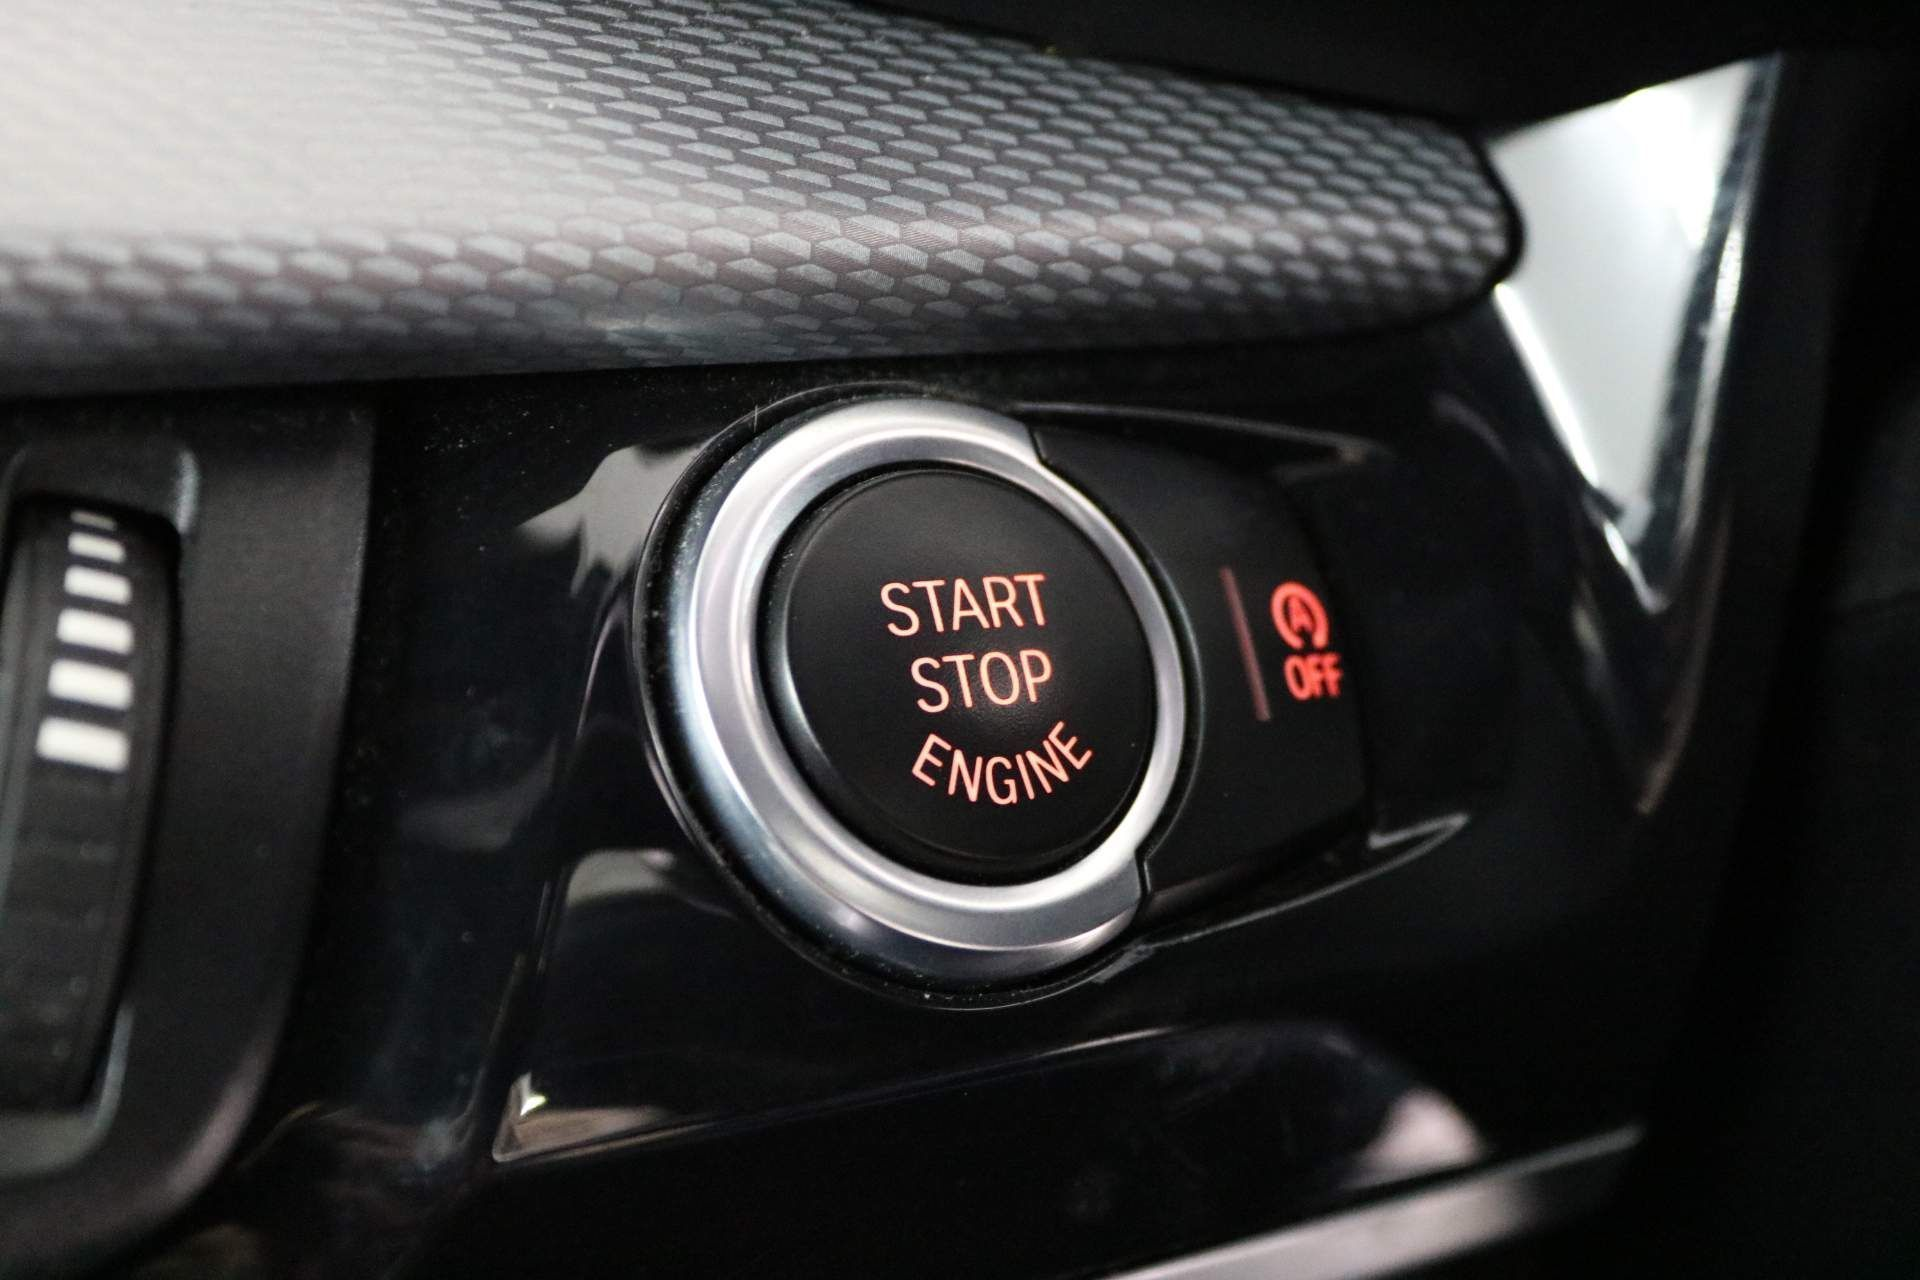 "BMW X5 3.0d xDrive""Auto"" Special Equipment - 15 Reg - 7 Seater -Leather - Sat Nav -Mega Spec- No Vat - Image 11 of 13"